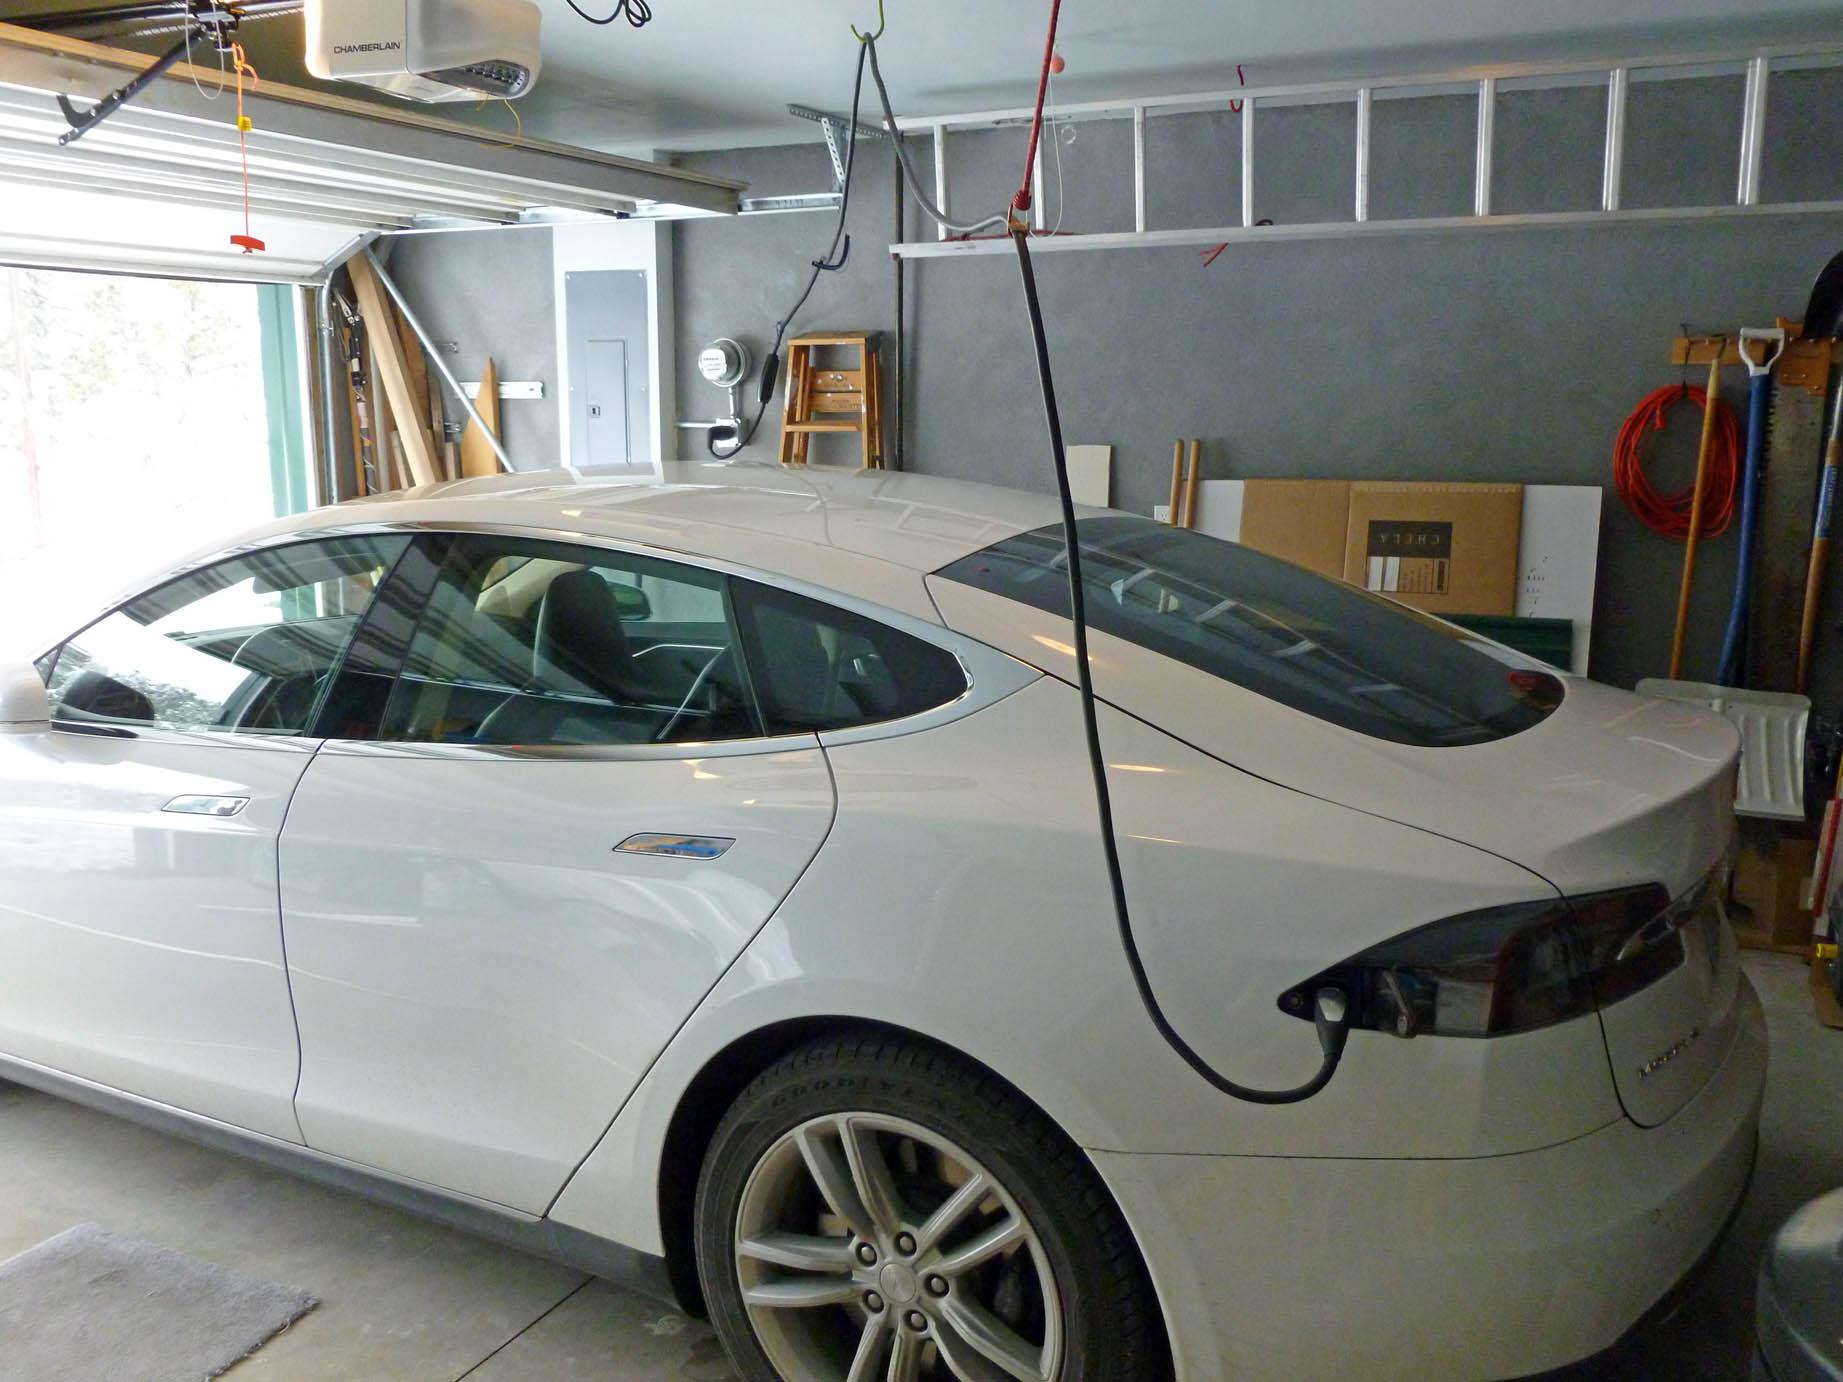 Model S in garage1665edsf 4-16-16.jpg